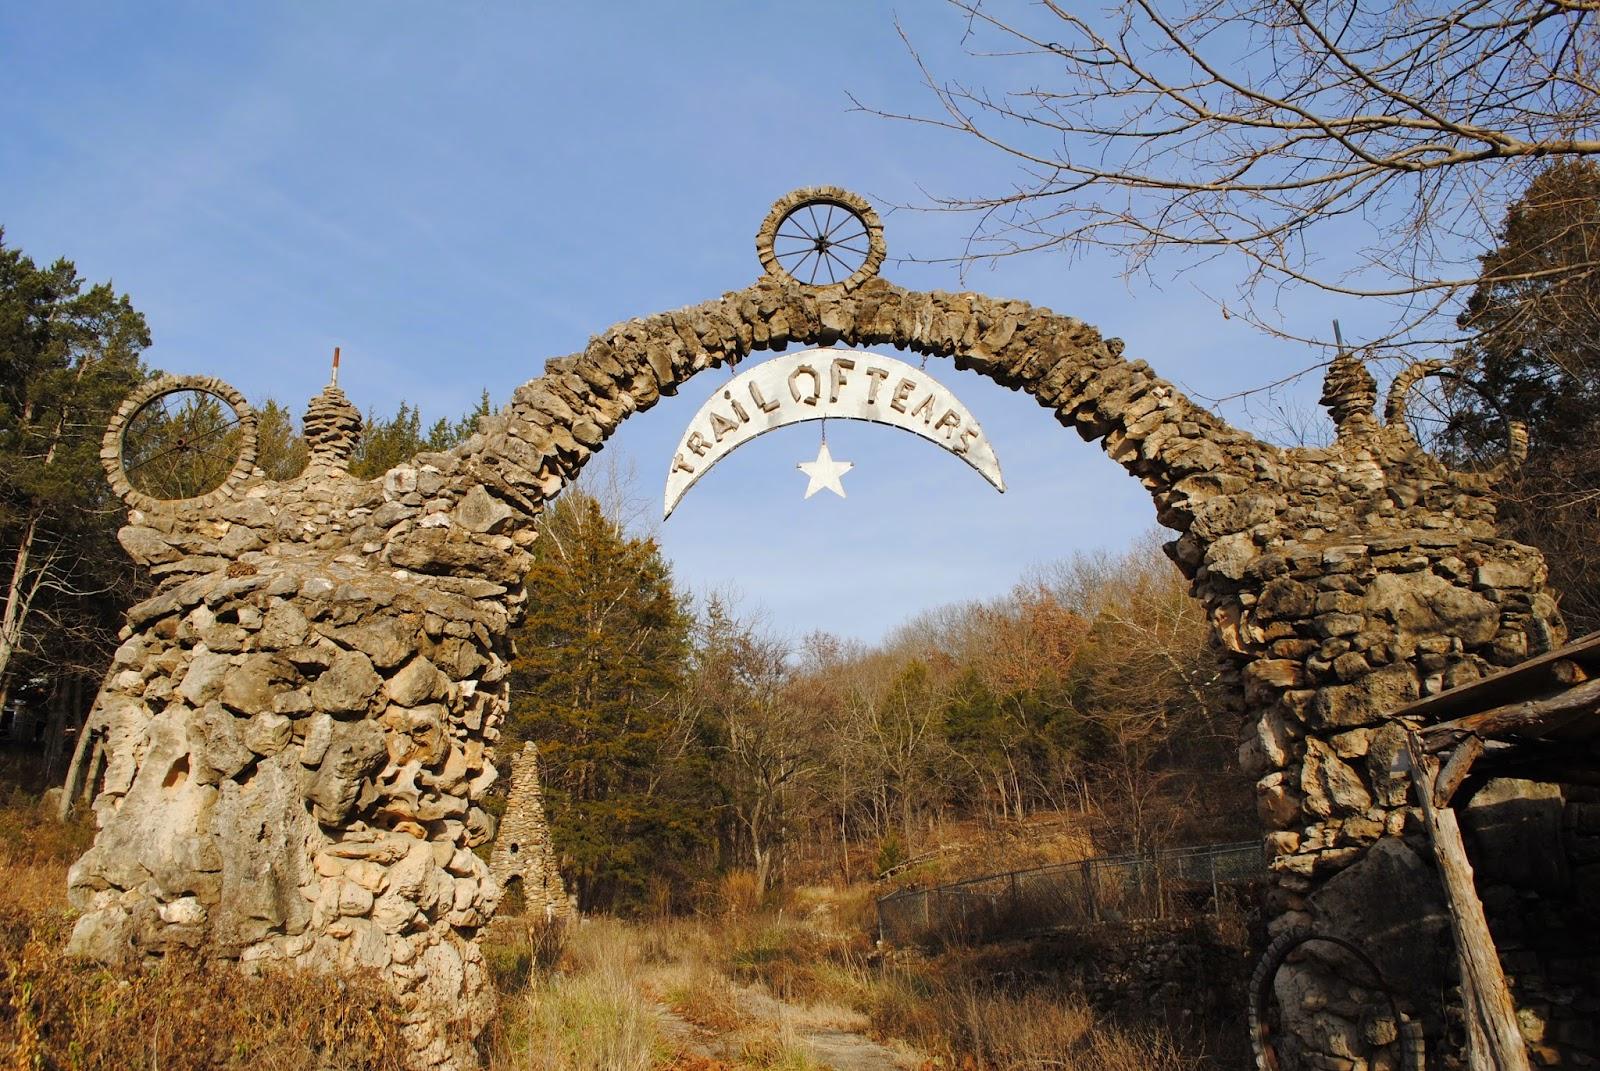 trail of tears historic trail